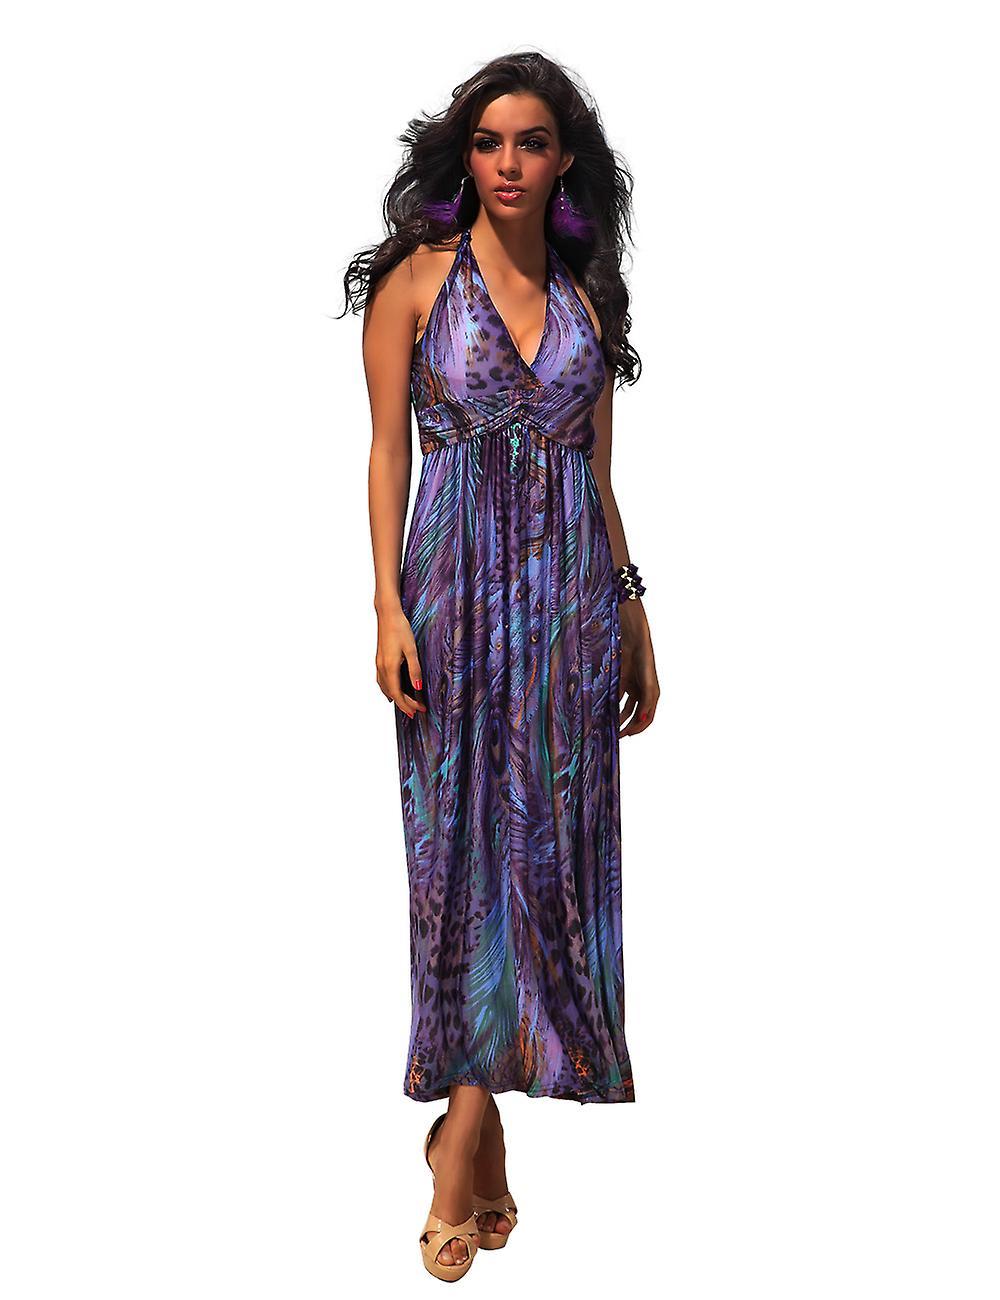 Waooh - Fashion - long animal print dress